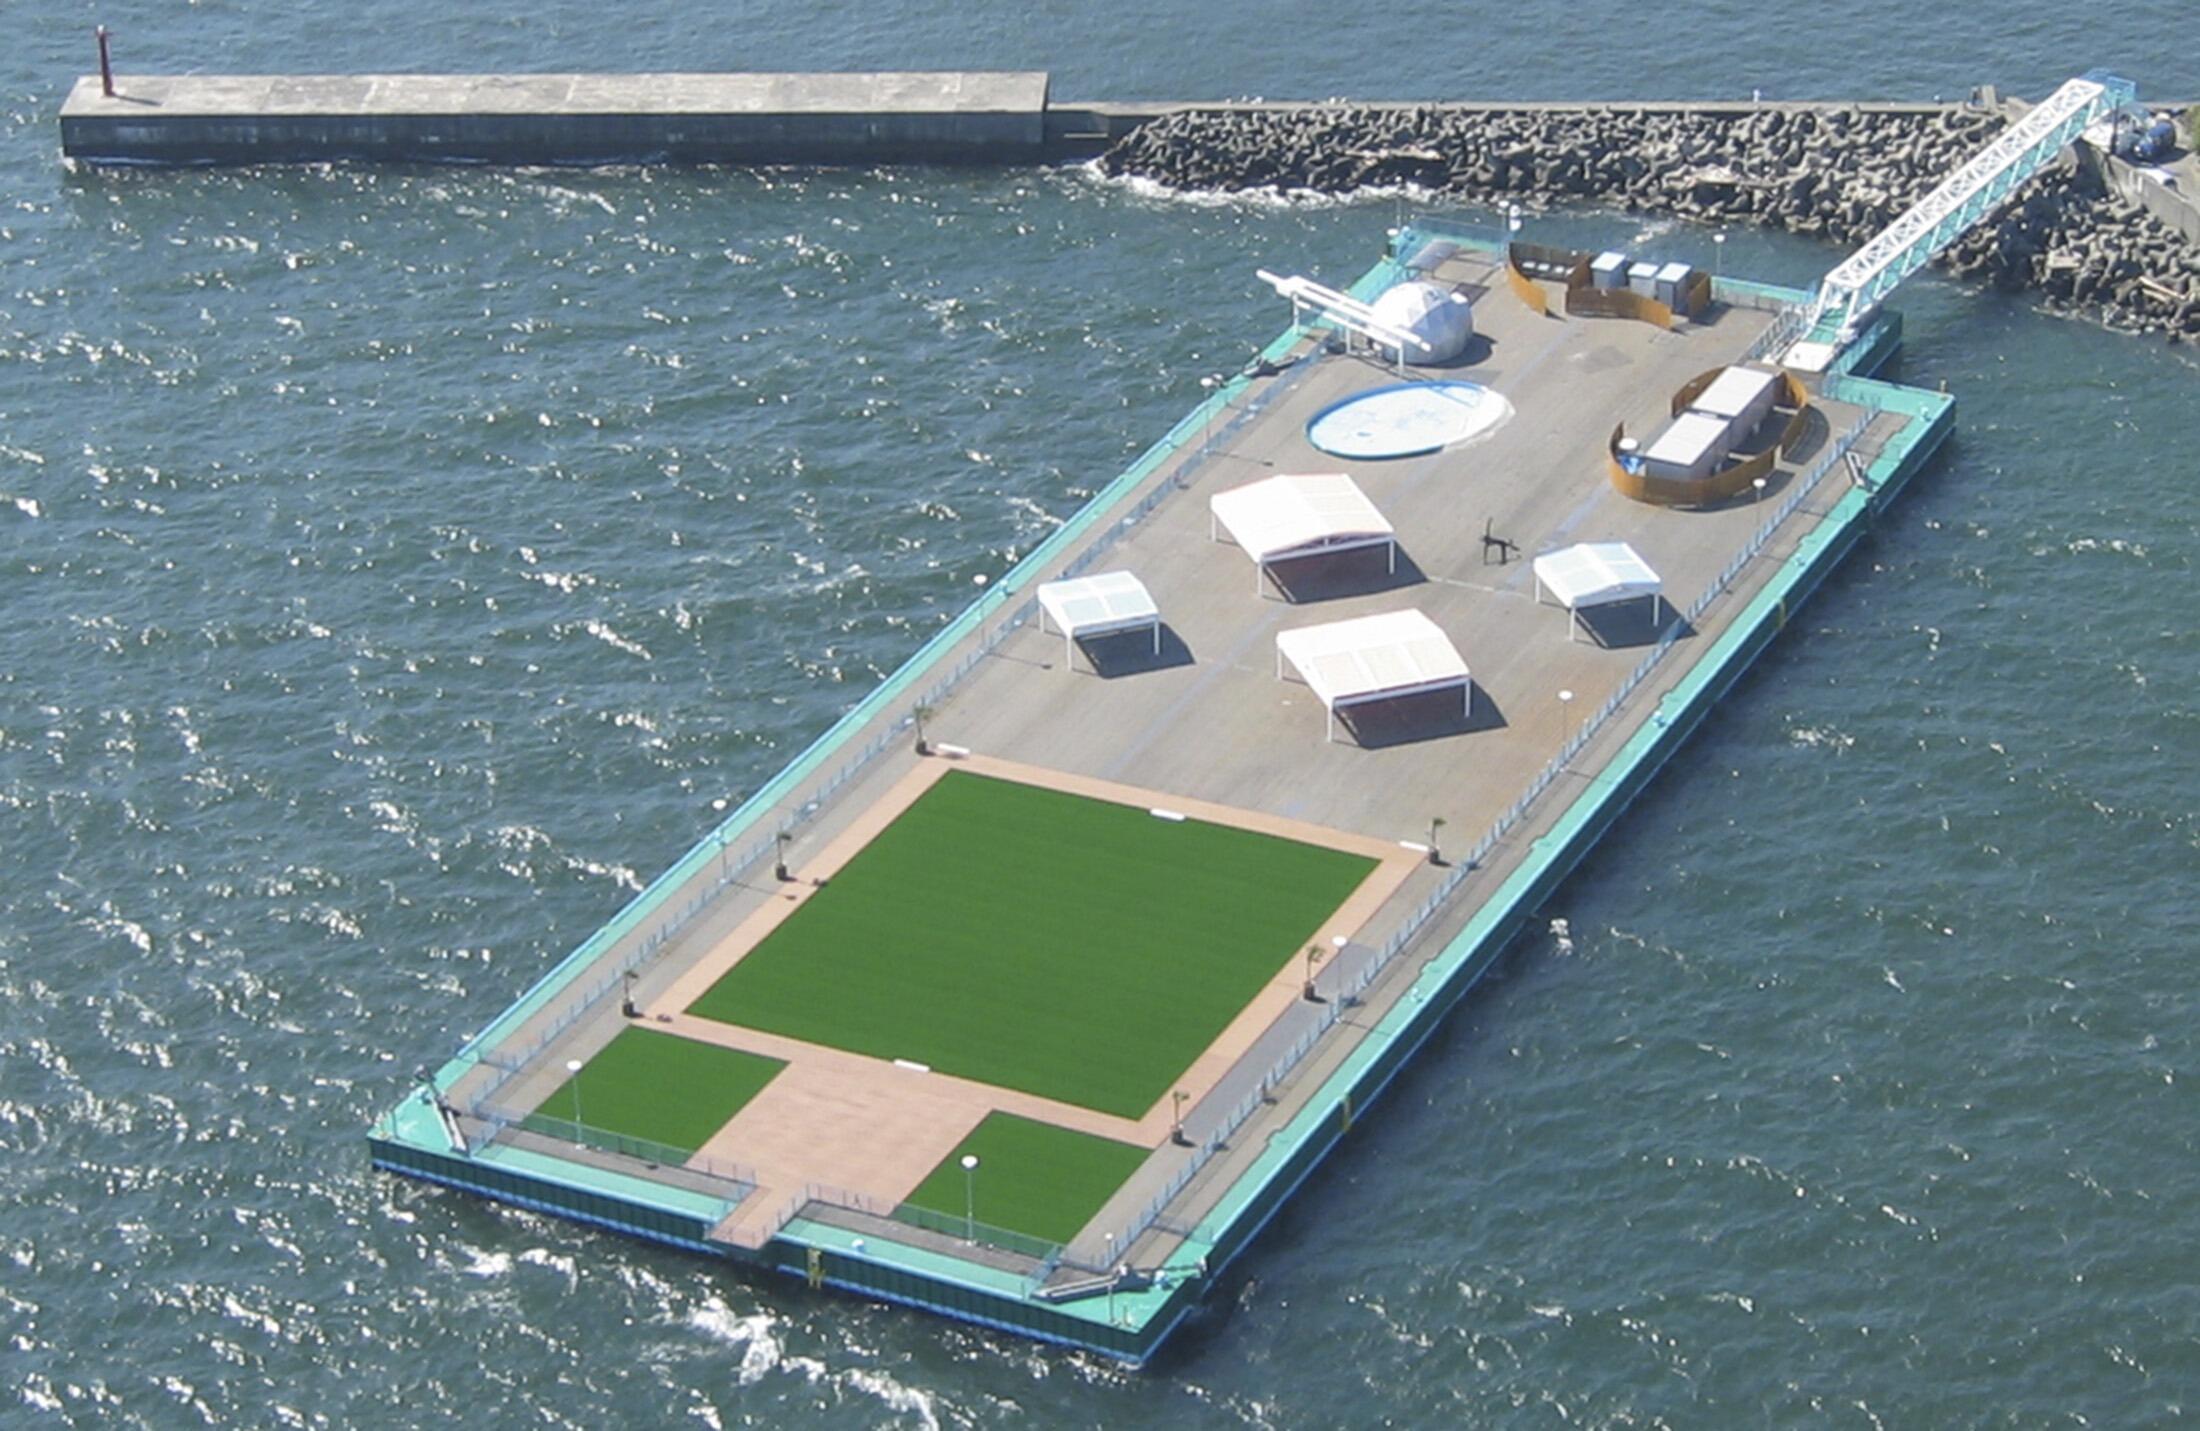 Tipo de plataforma a ser utilizada pela central de Fukushima para estocar a água ionisada.